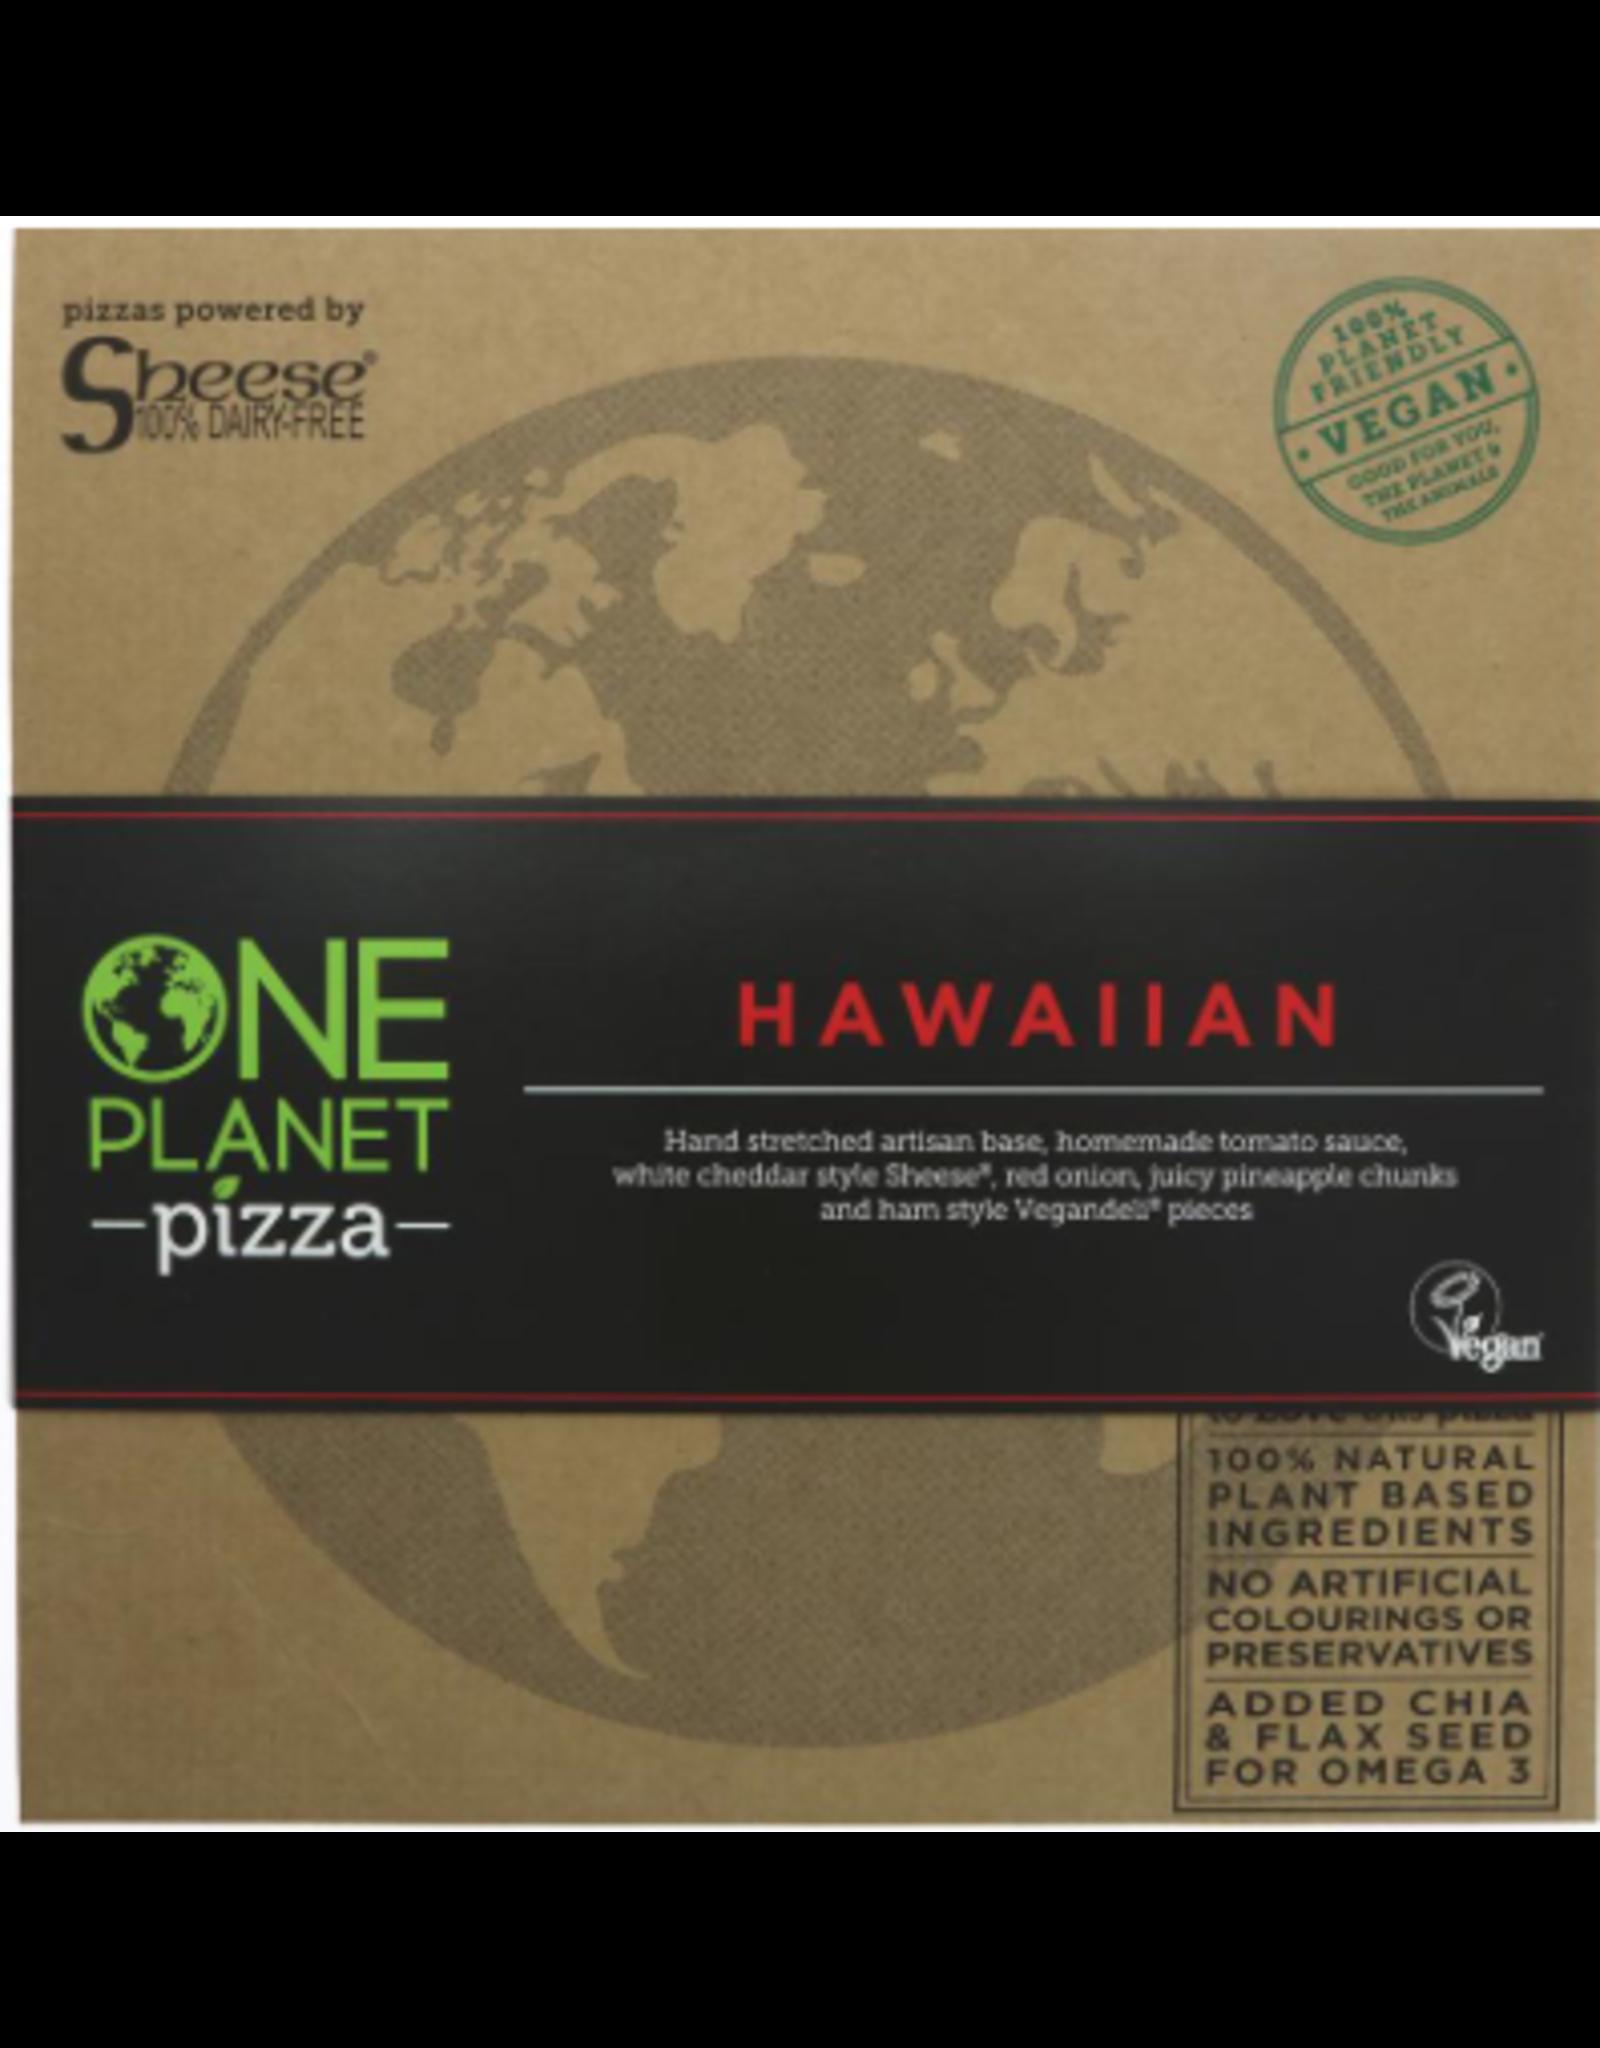 One Planet Pizza Haiwana-Pizza, 455g  ❄️❄️❄️